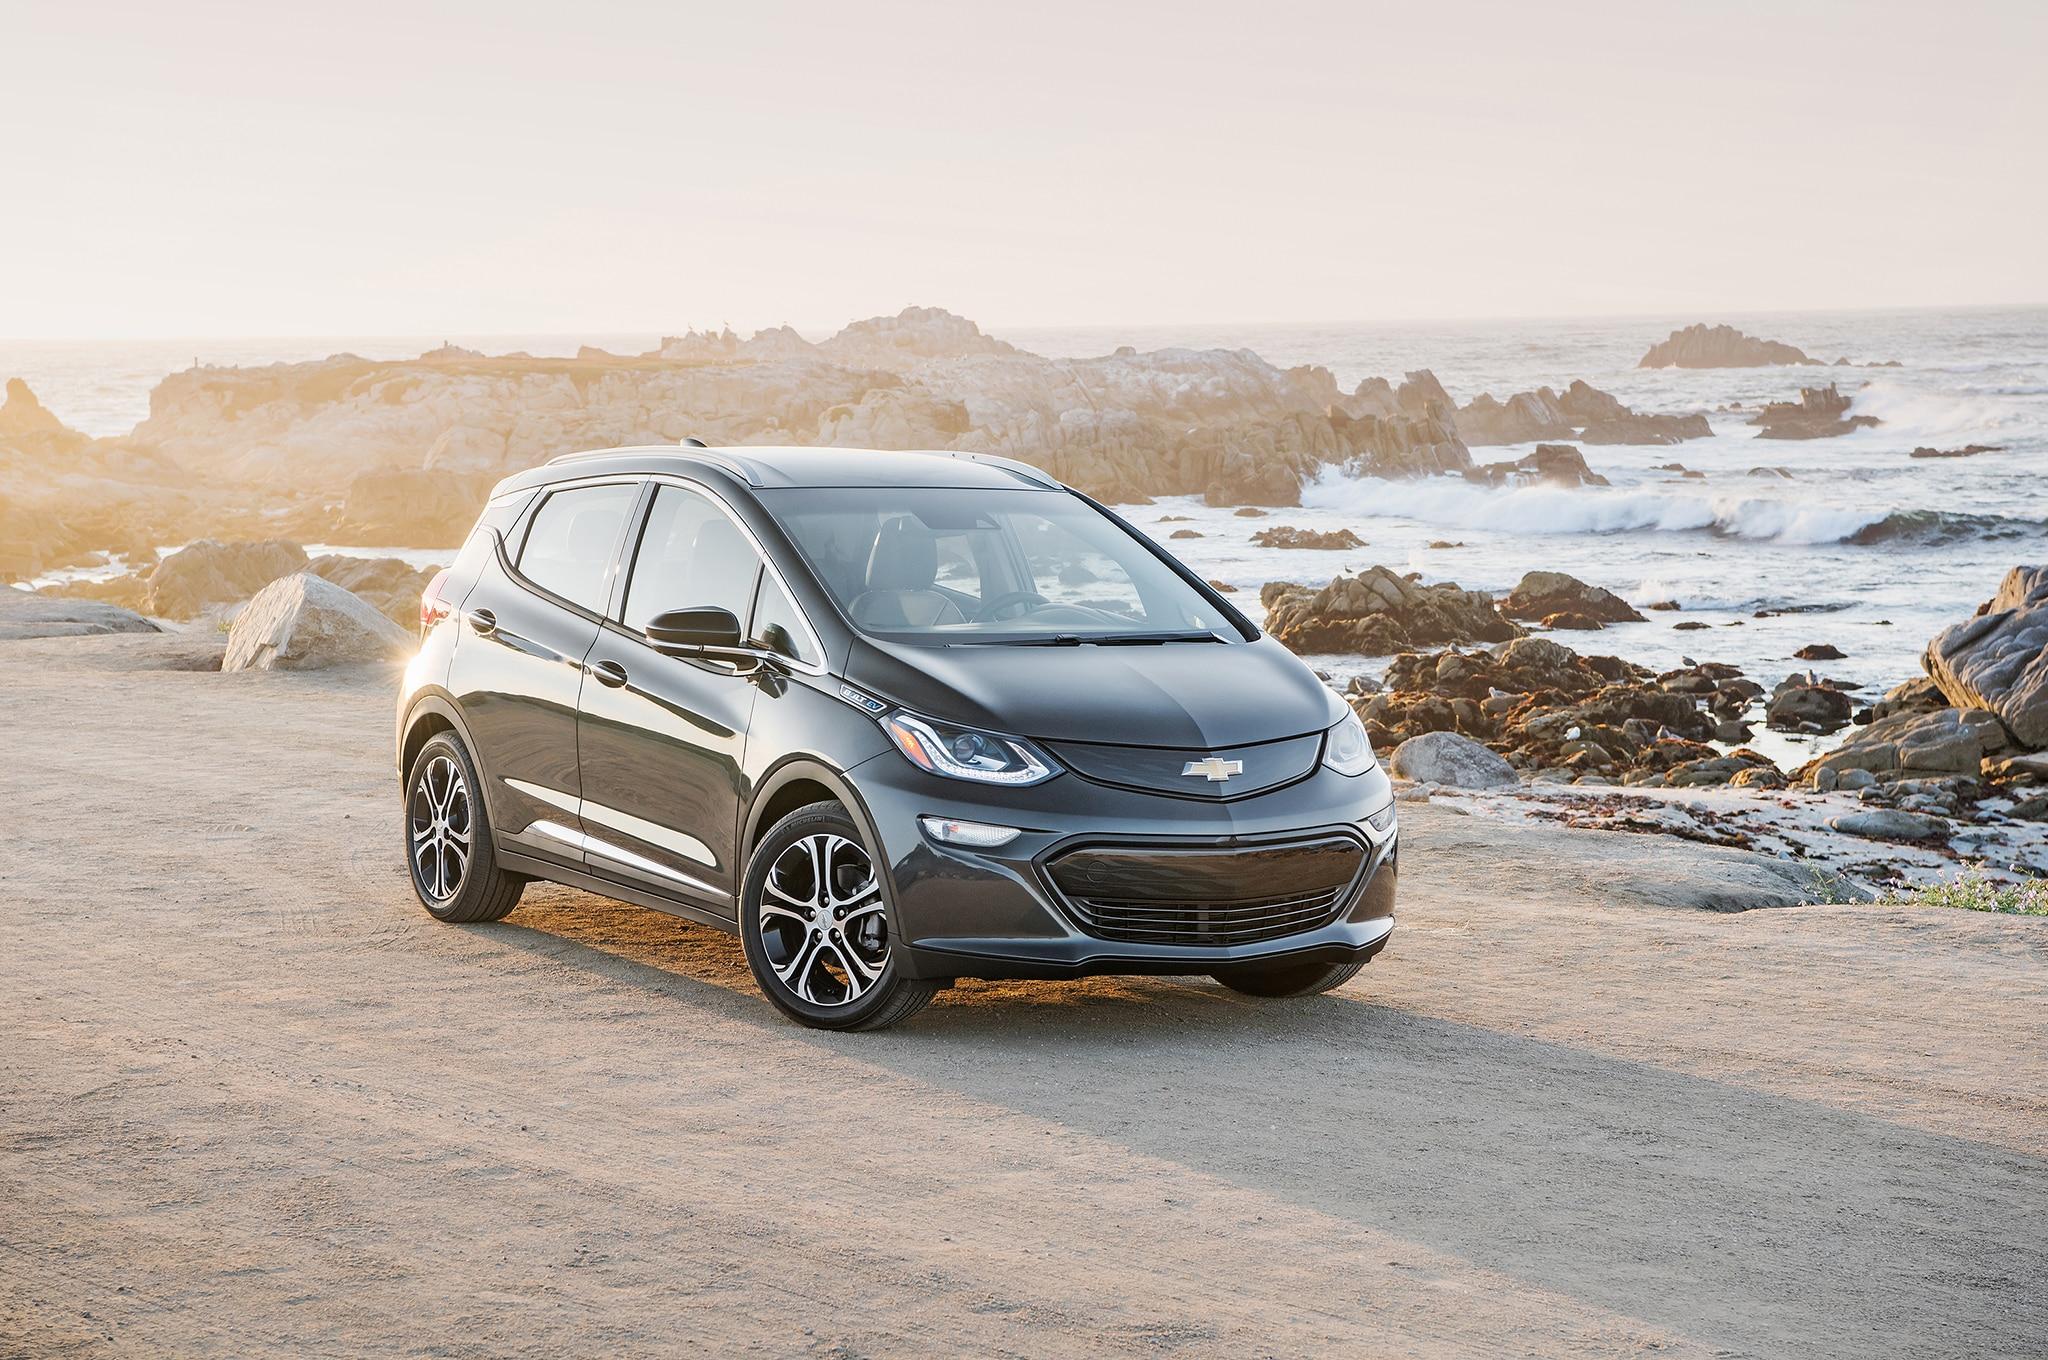 2017 Chevrolet Bolt EV Front Three Quarter 04